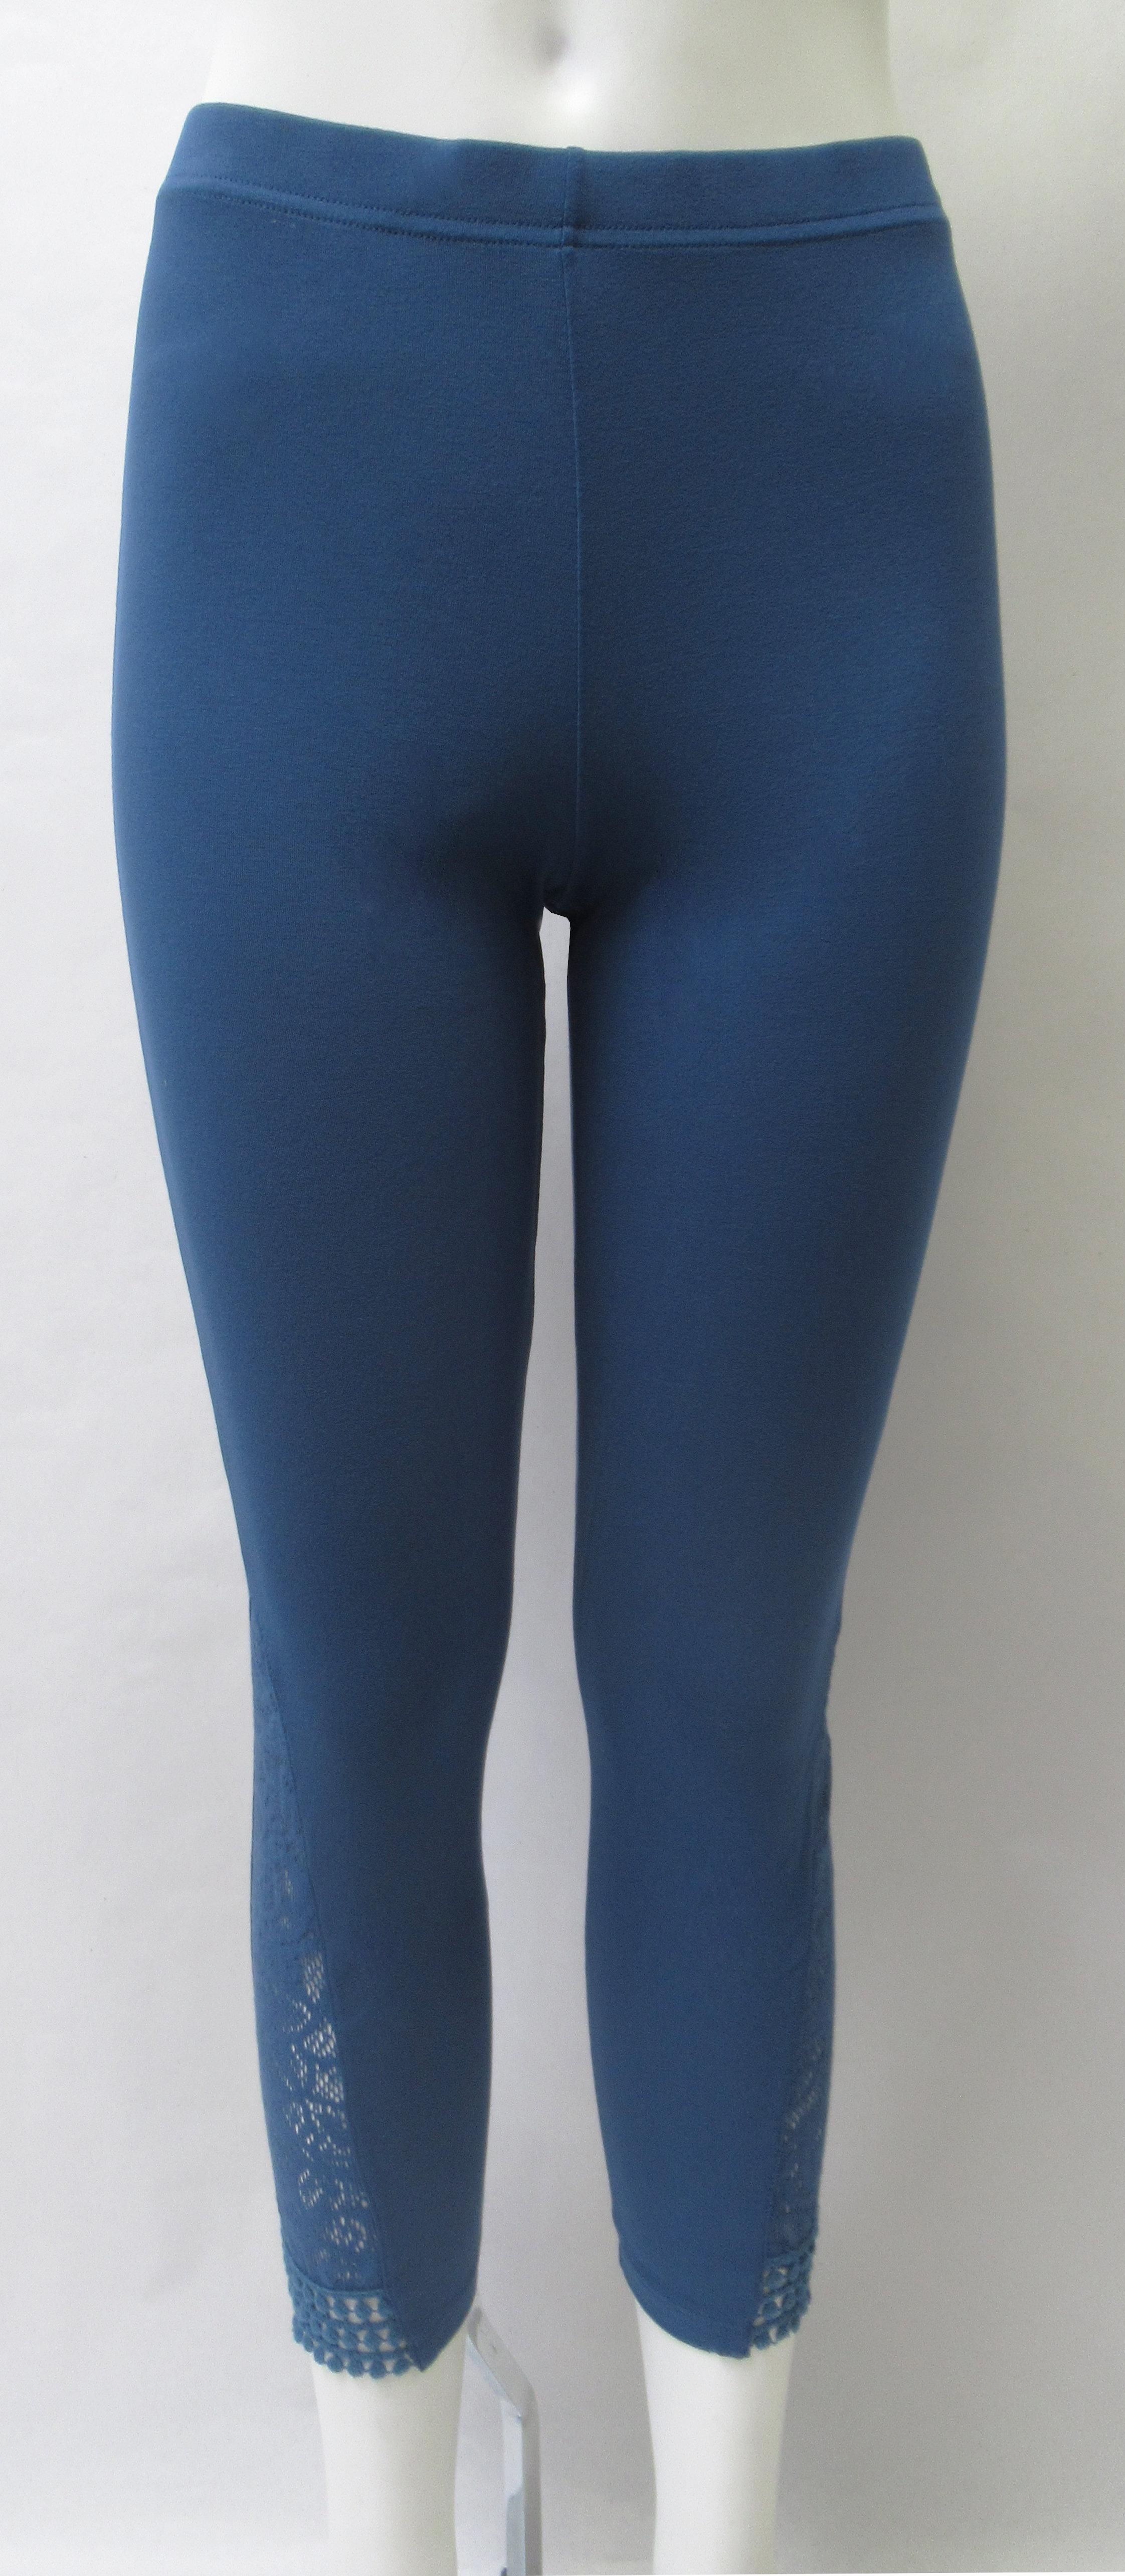 Maloka: Arabesque Side Window Legging SOLD OUT